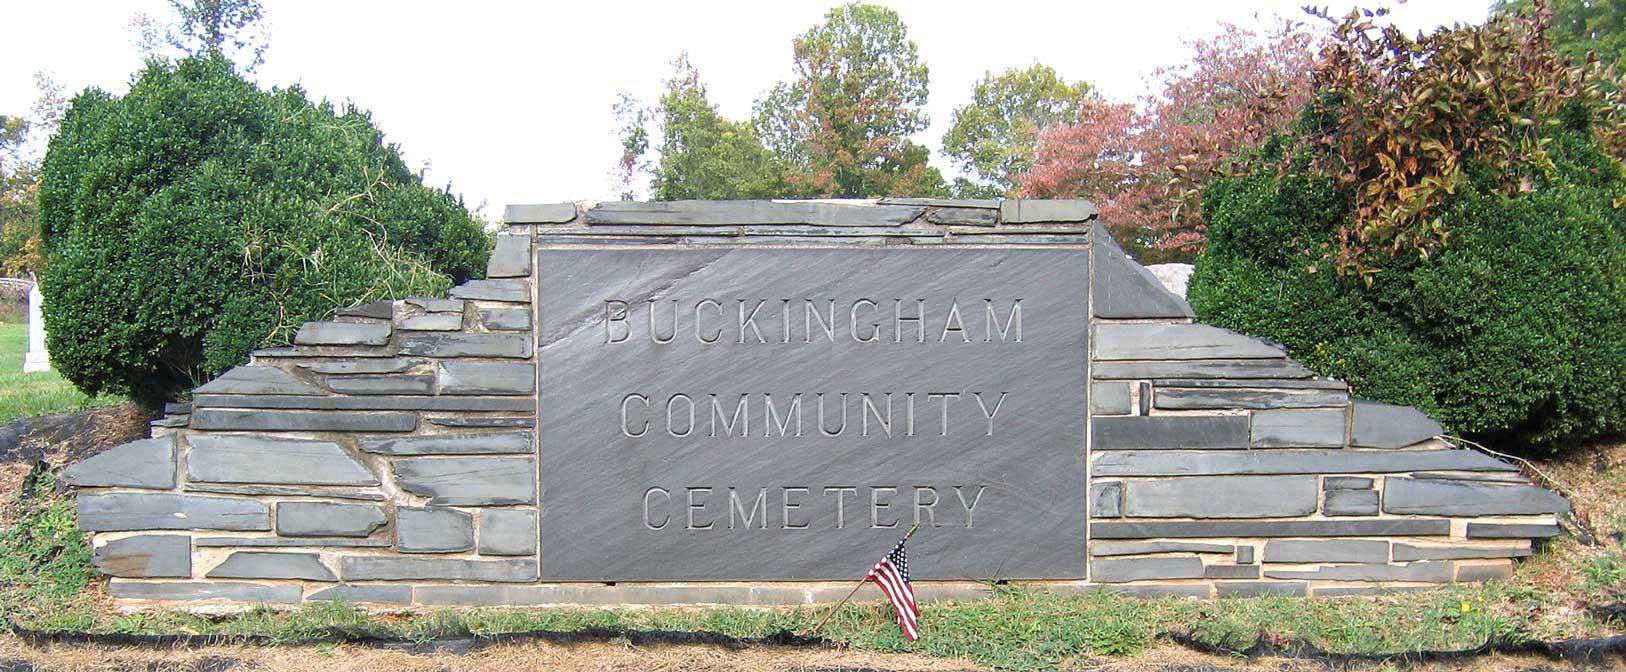 Buckingham Community Cemetery